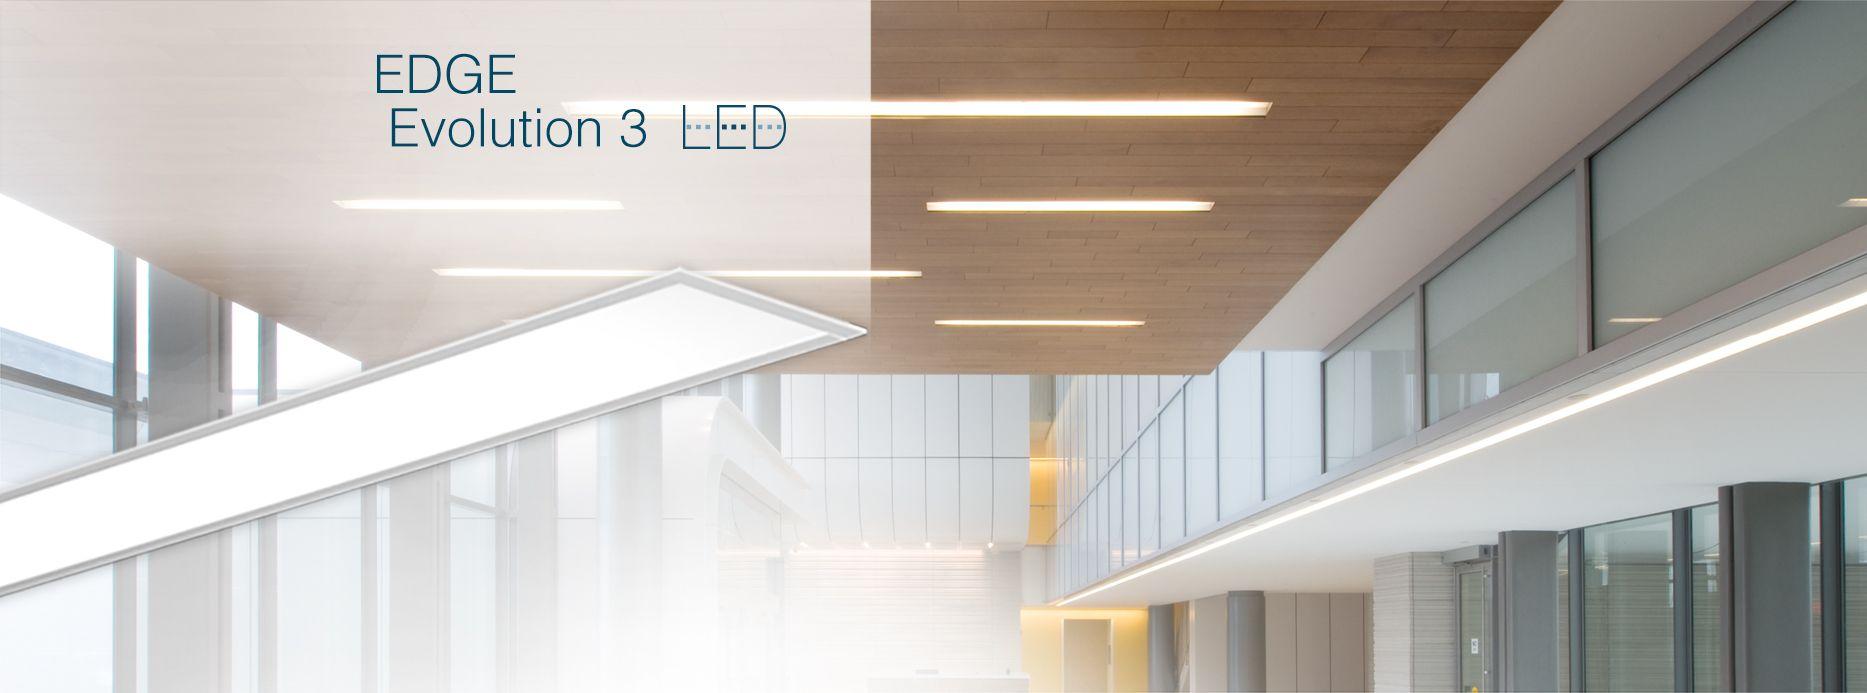 Pinnacle Architectural Lighting Edge Evolution 3 Led